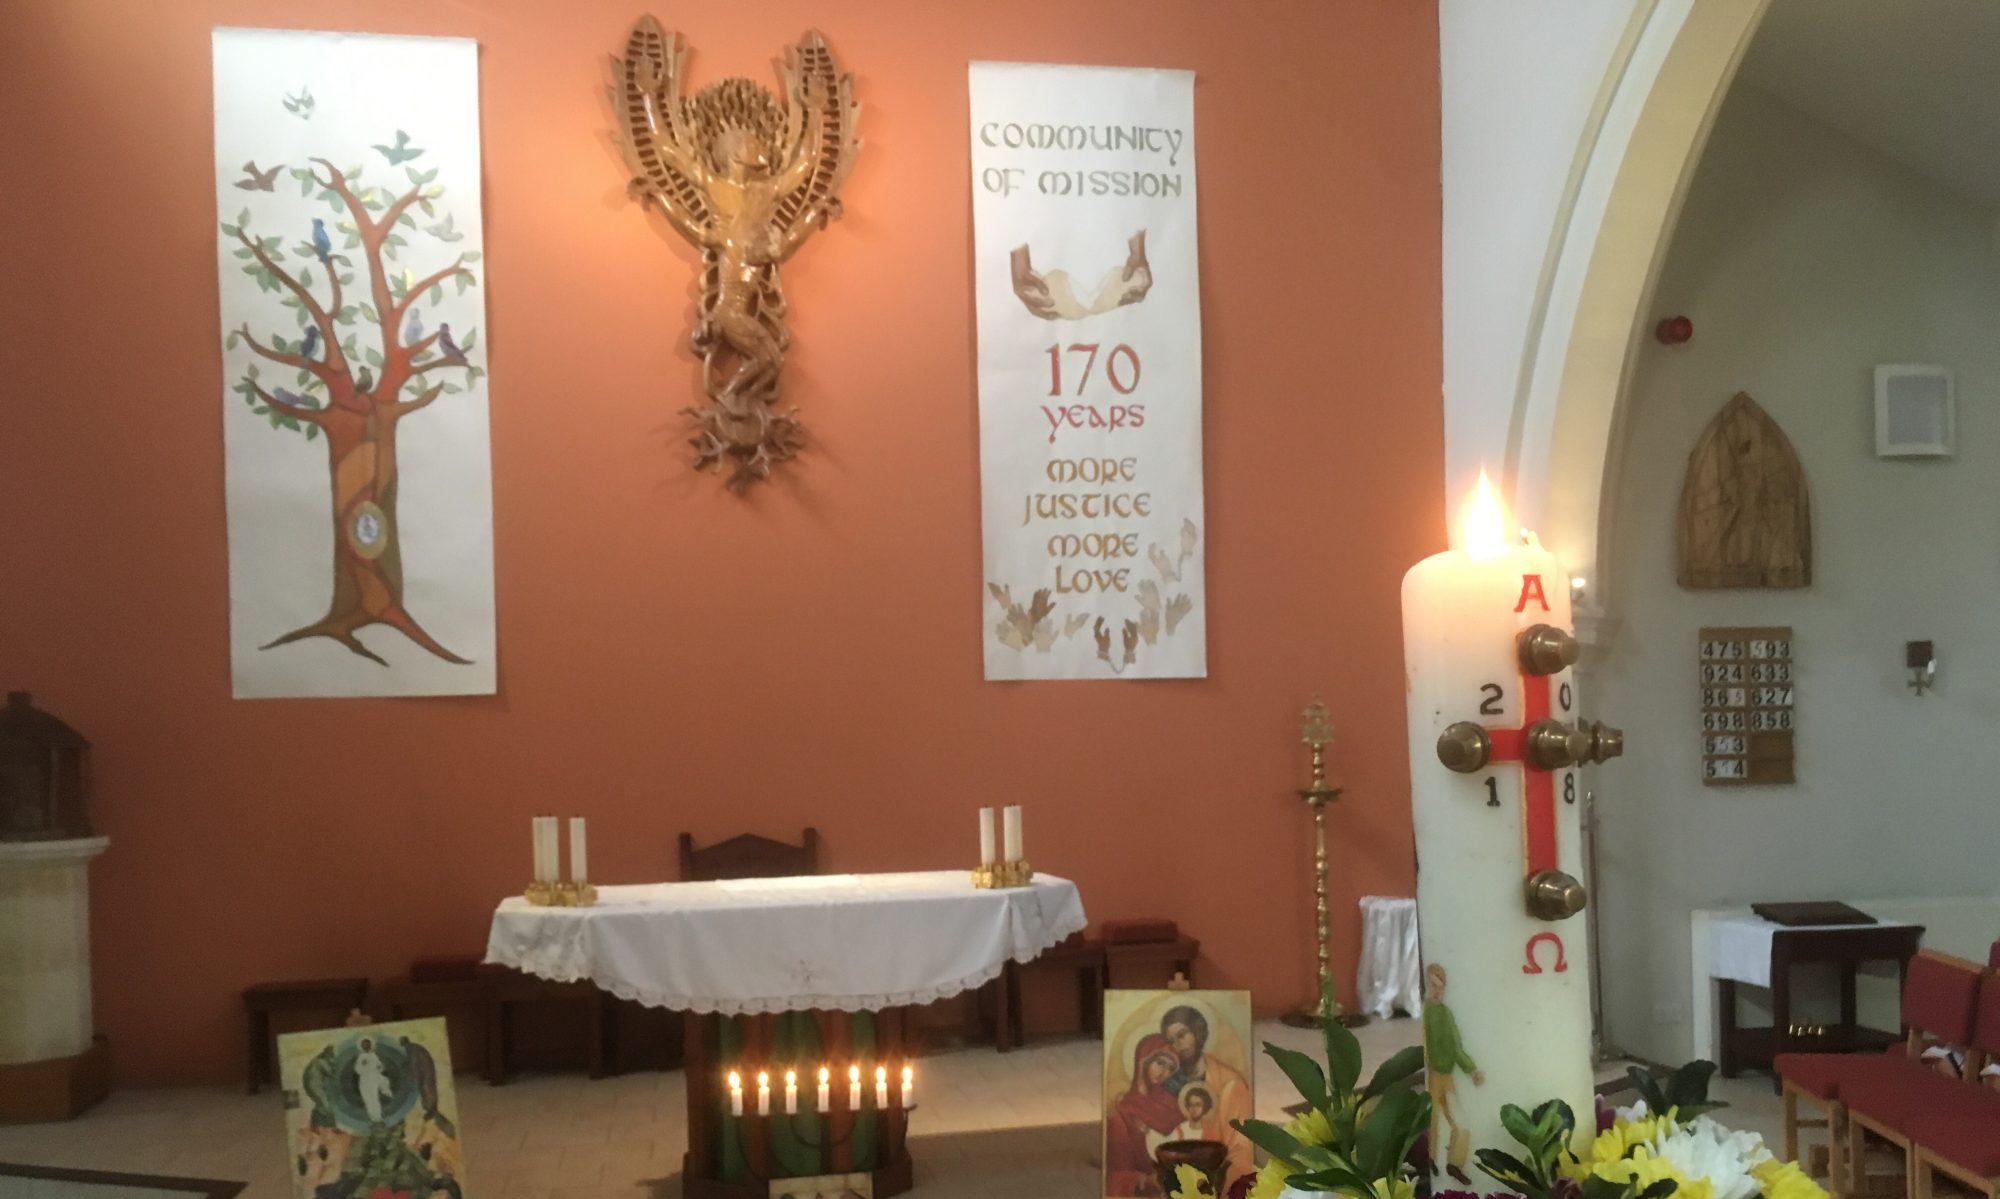 St Nicholas of Tolentino RC Church